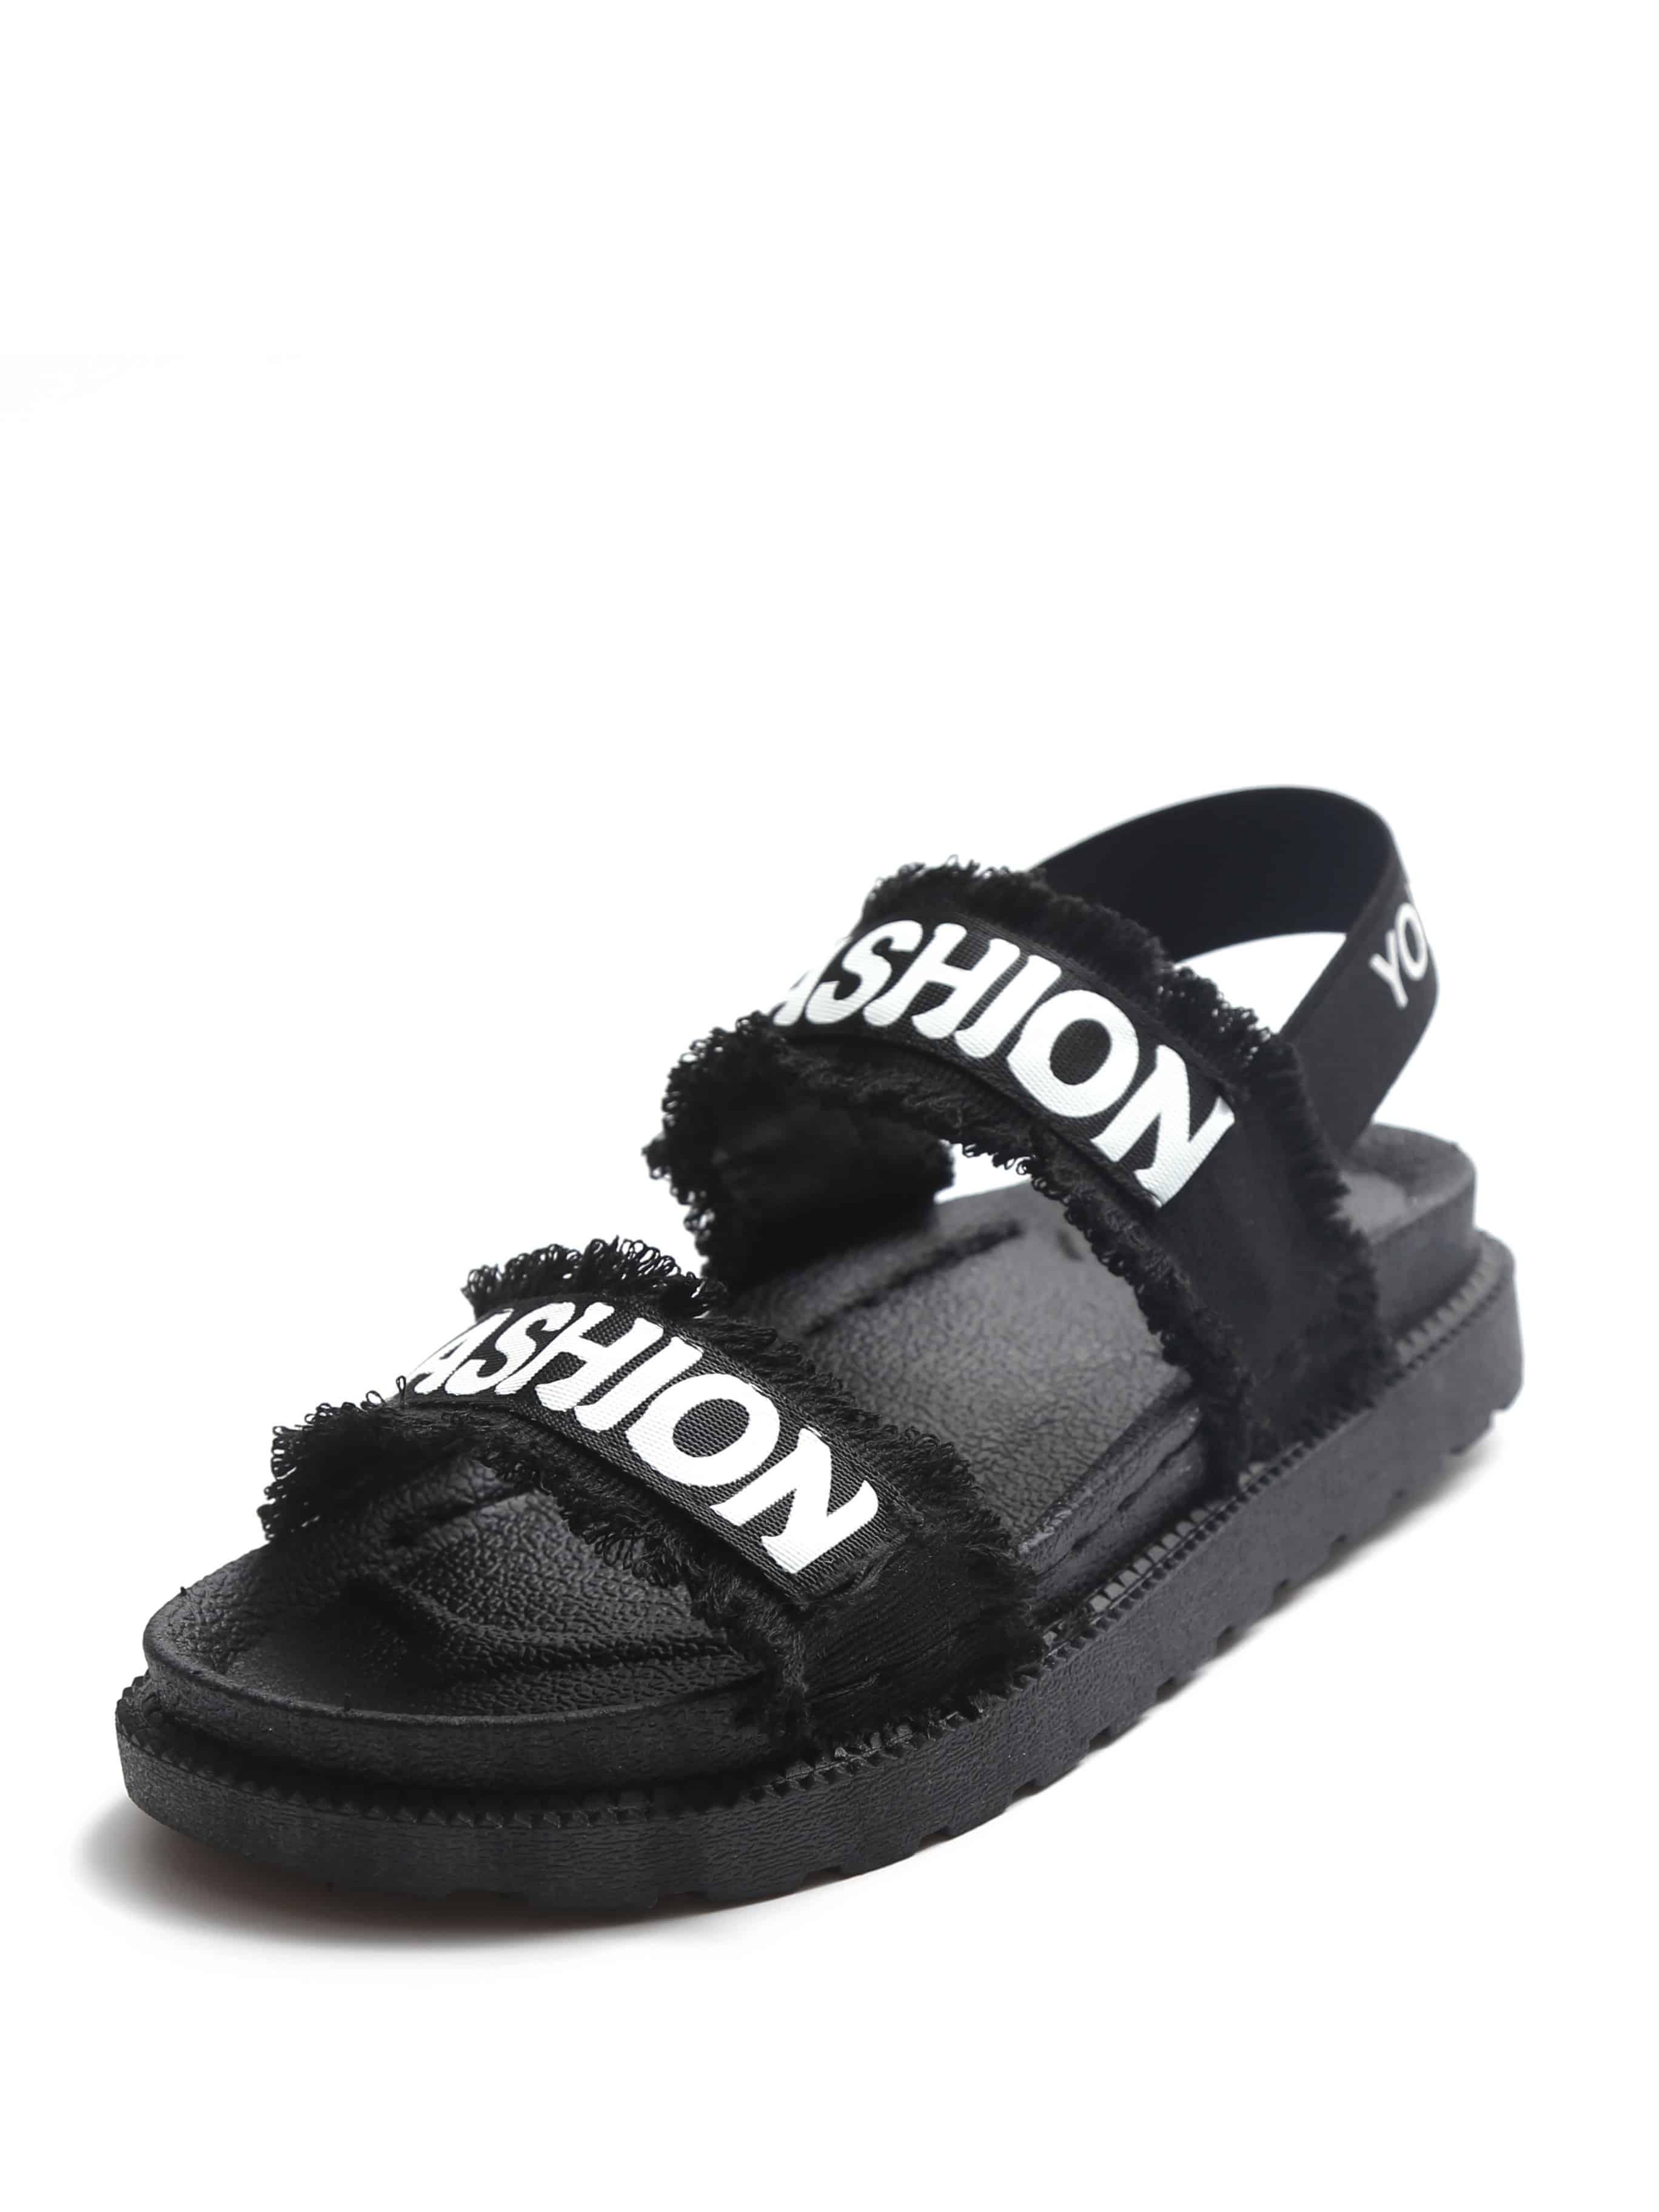 Slogan Patch Frayed Trim Sandals Emmacloth Women Fast